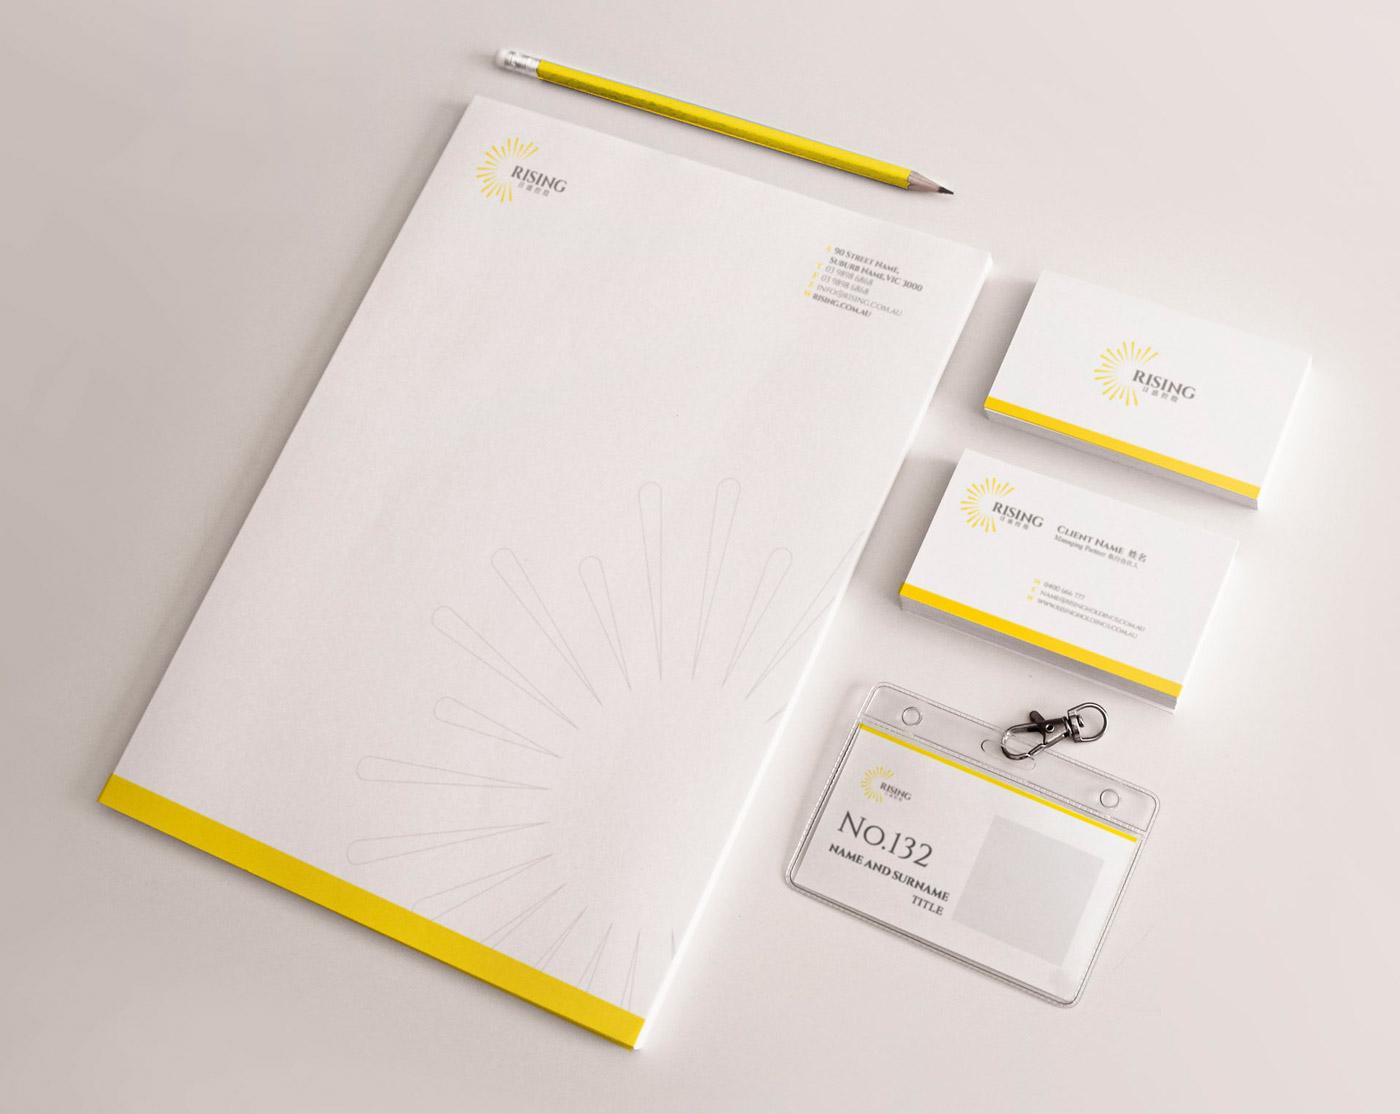 property developer company branding by Z Creative Studio Branding & Graphic Design Melbourne